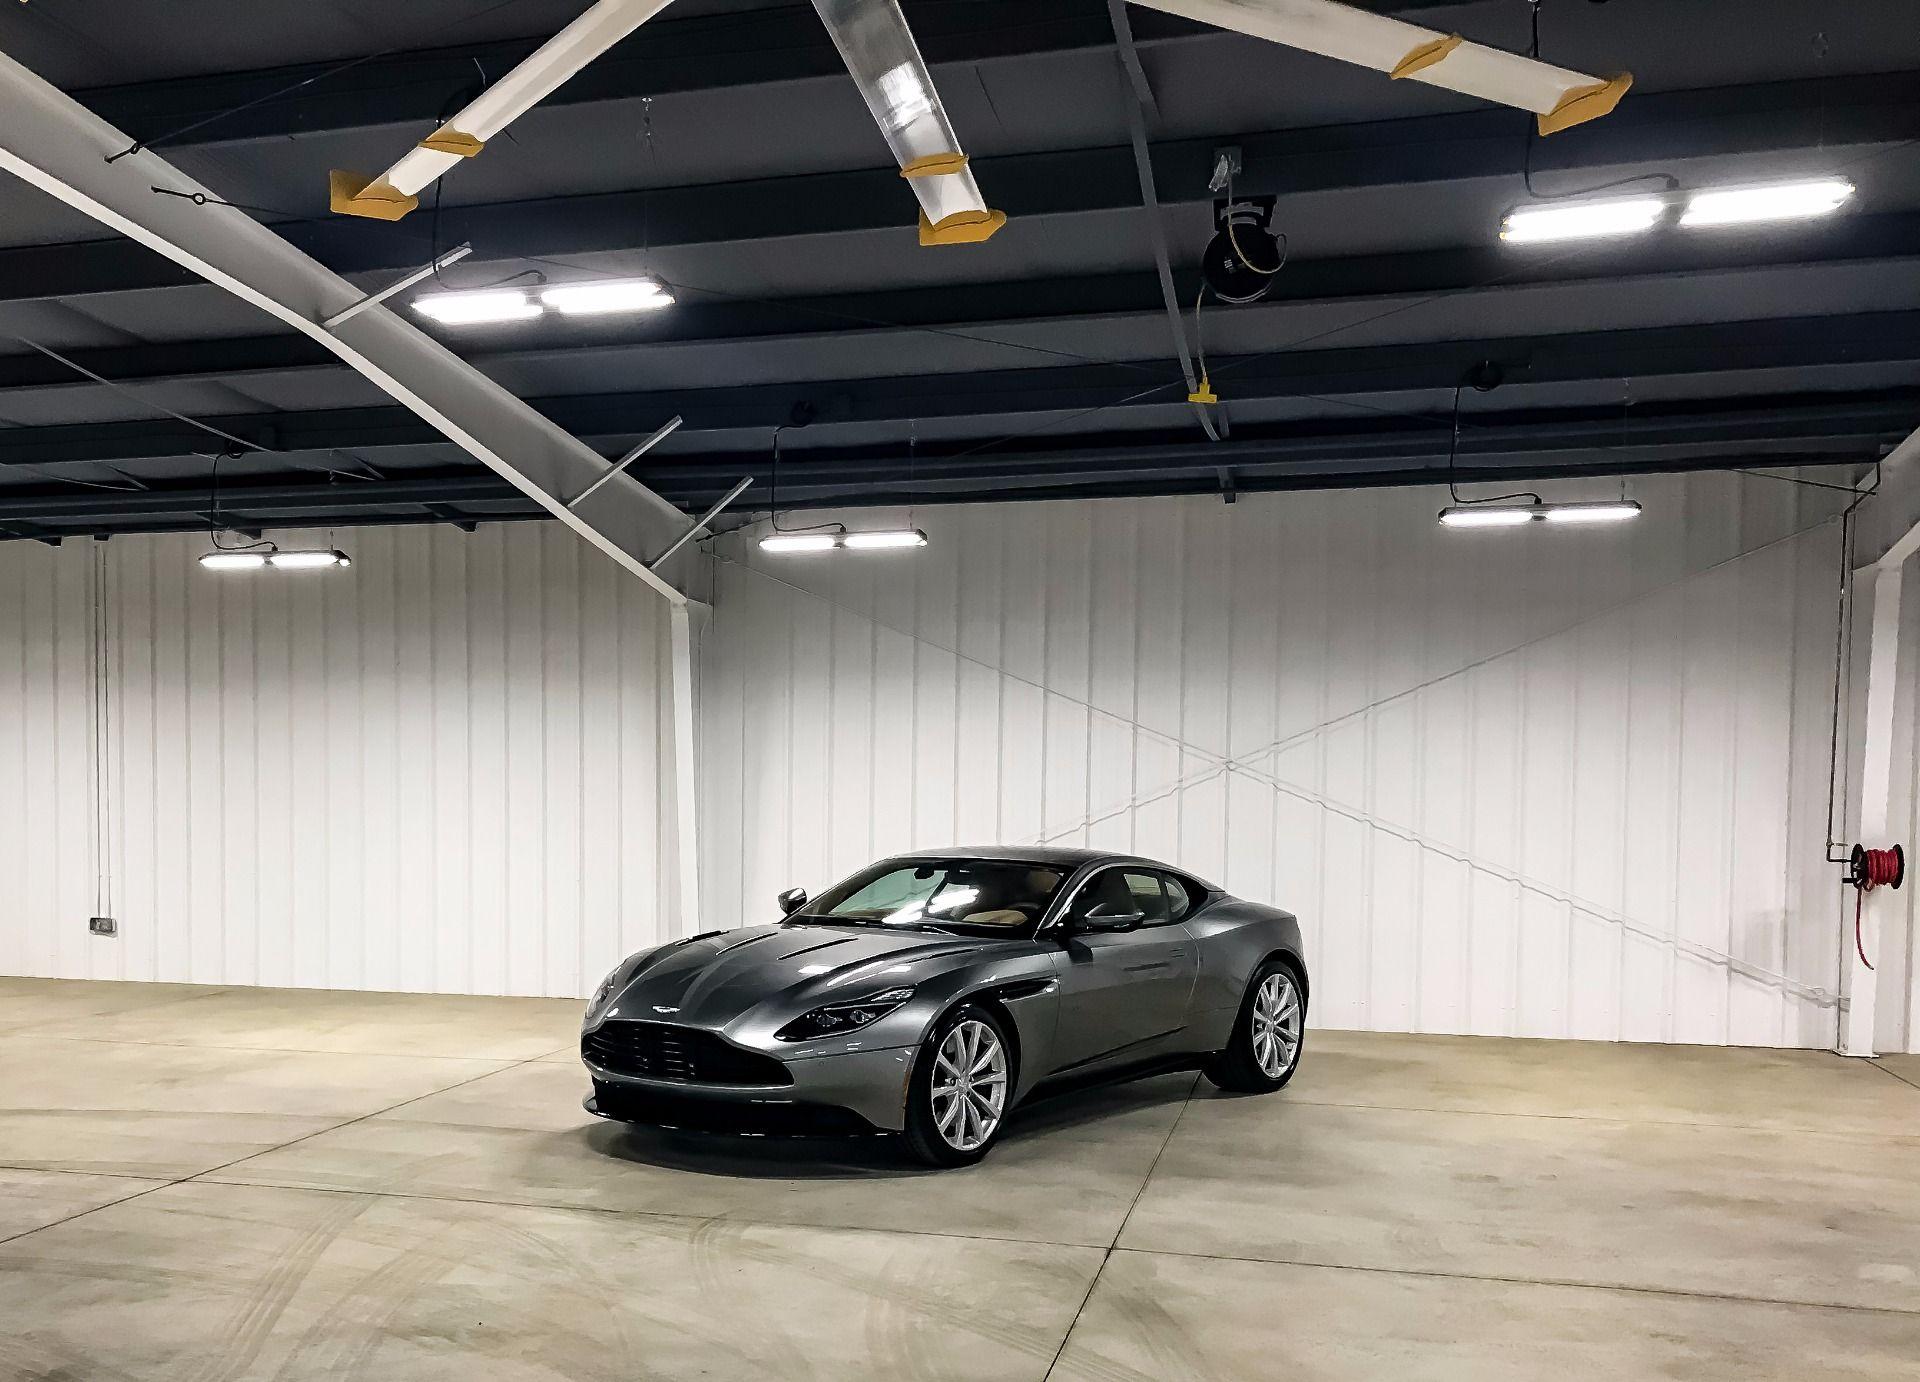 2017 Aston Martin DB11 Stock GC MIR165 for sale near Chicago IL